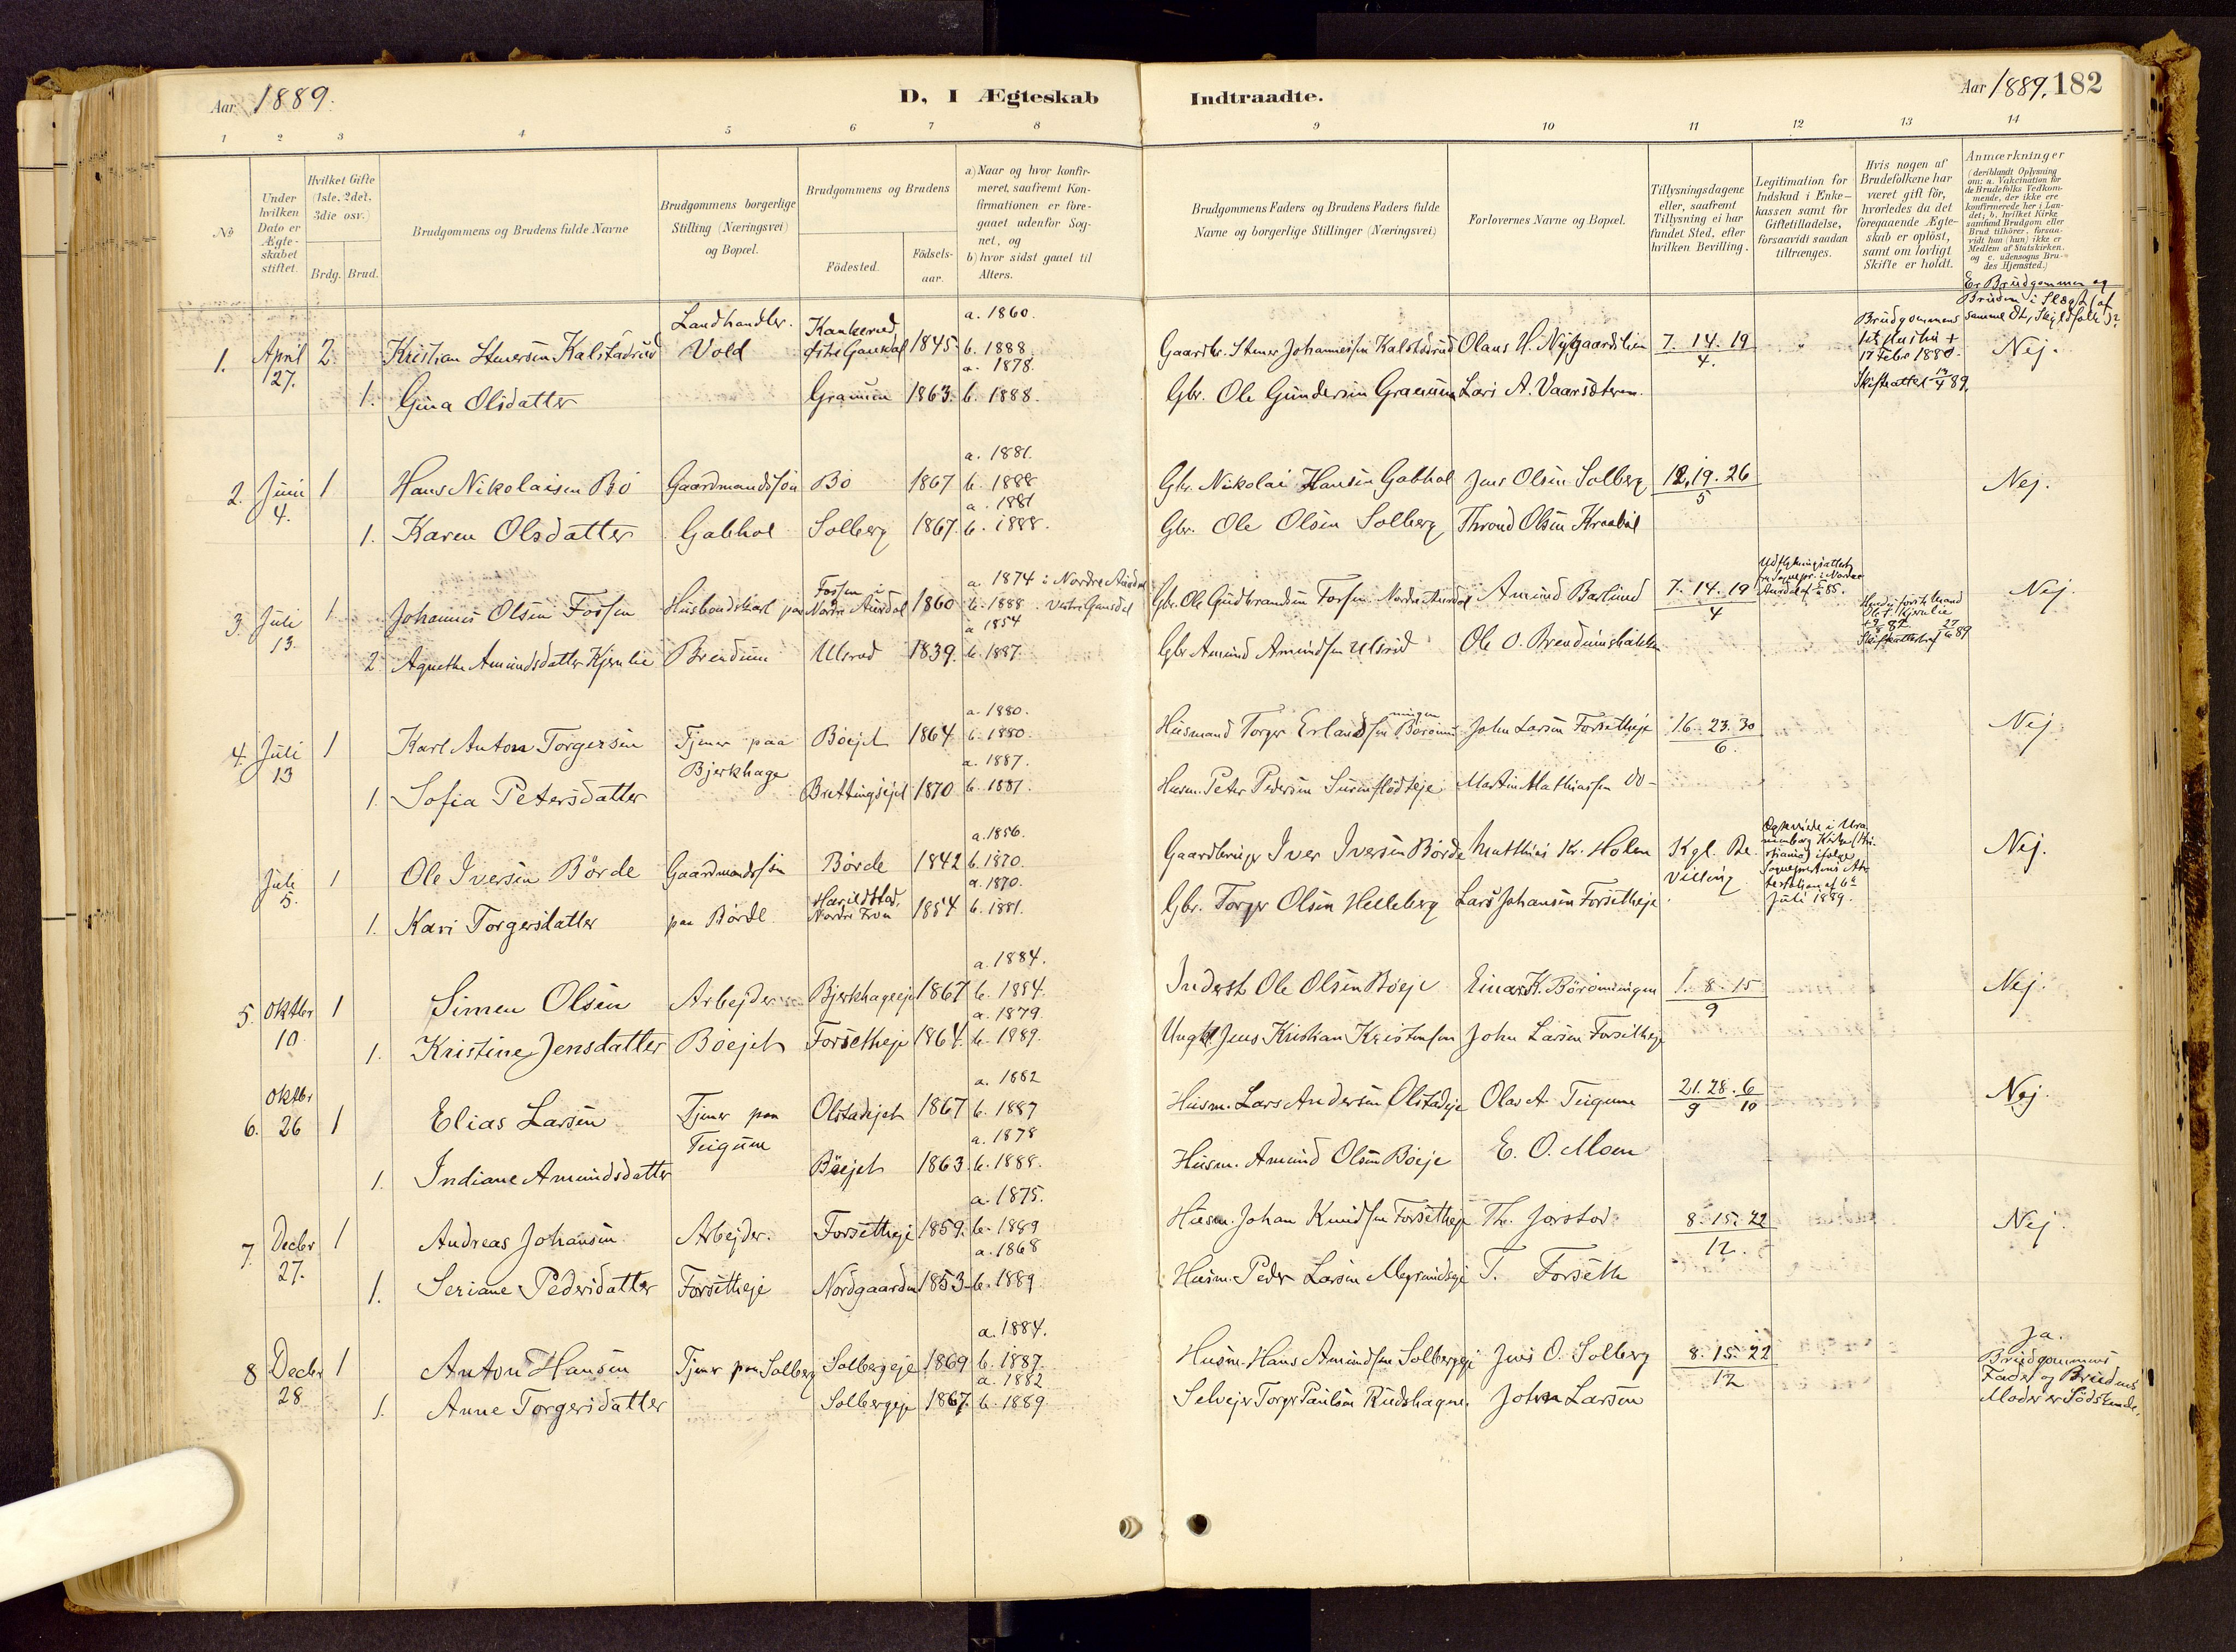 SAH, Vestre Gausdal prestekontor, Ministerialbok nr. 1, 1887-1914, s. 182